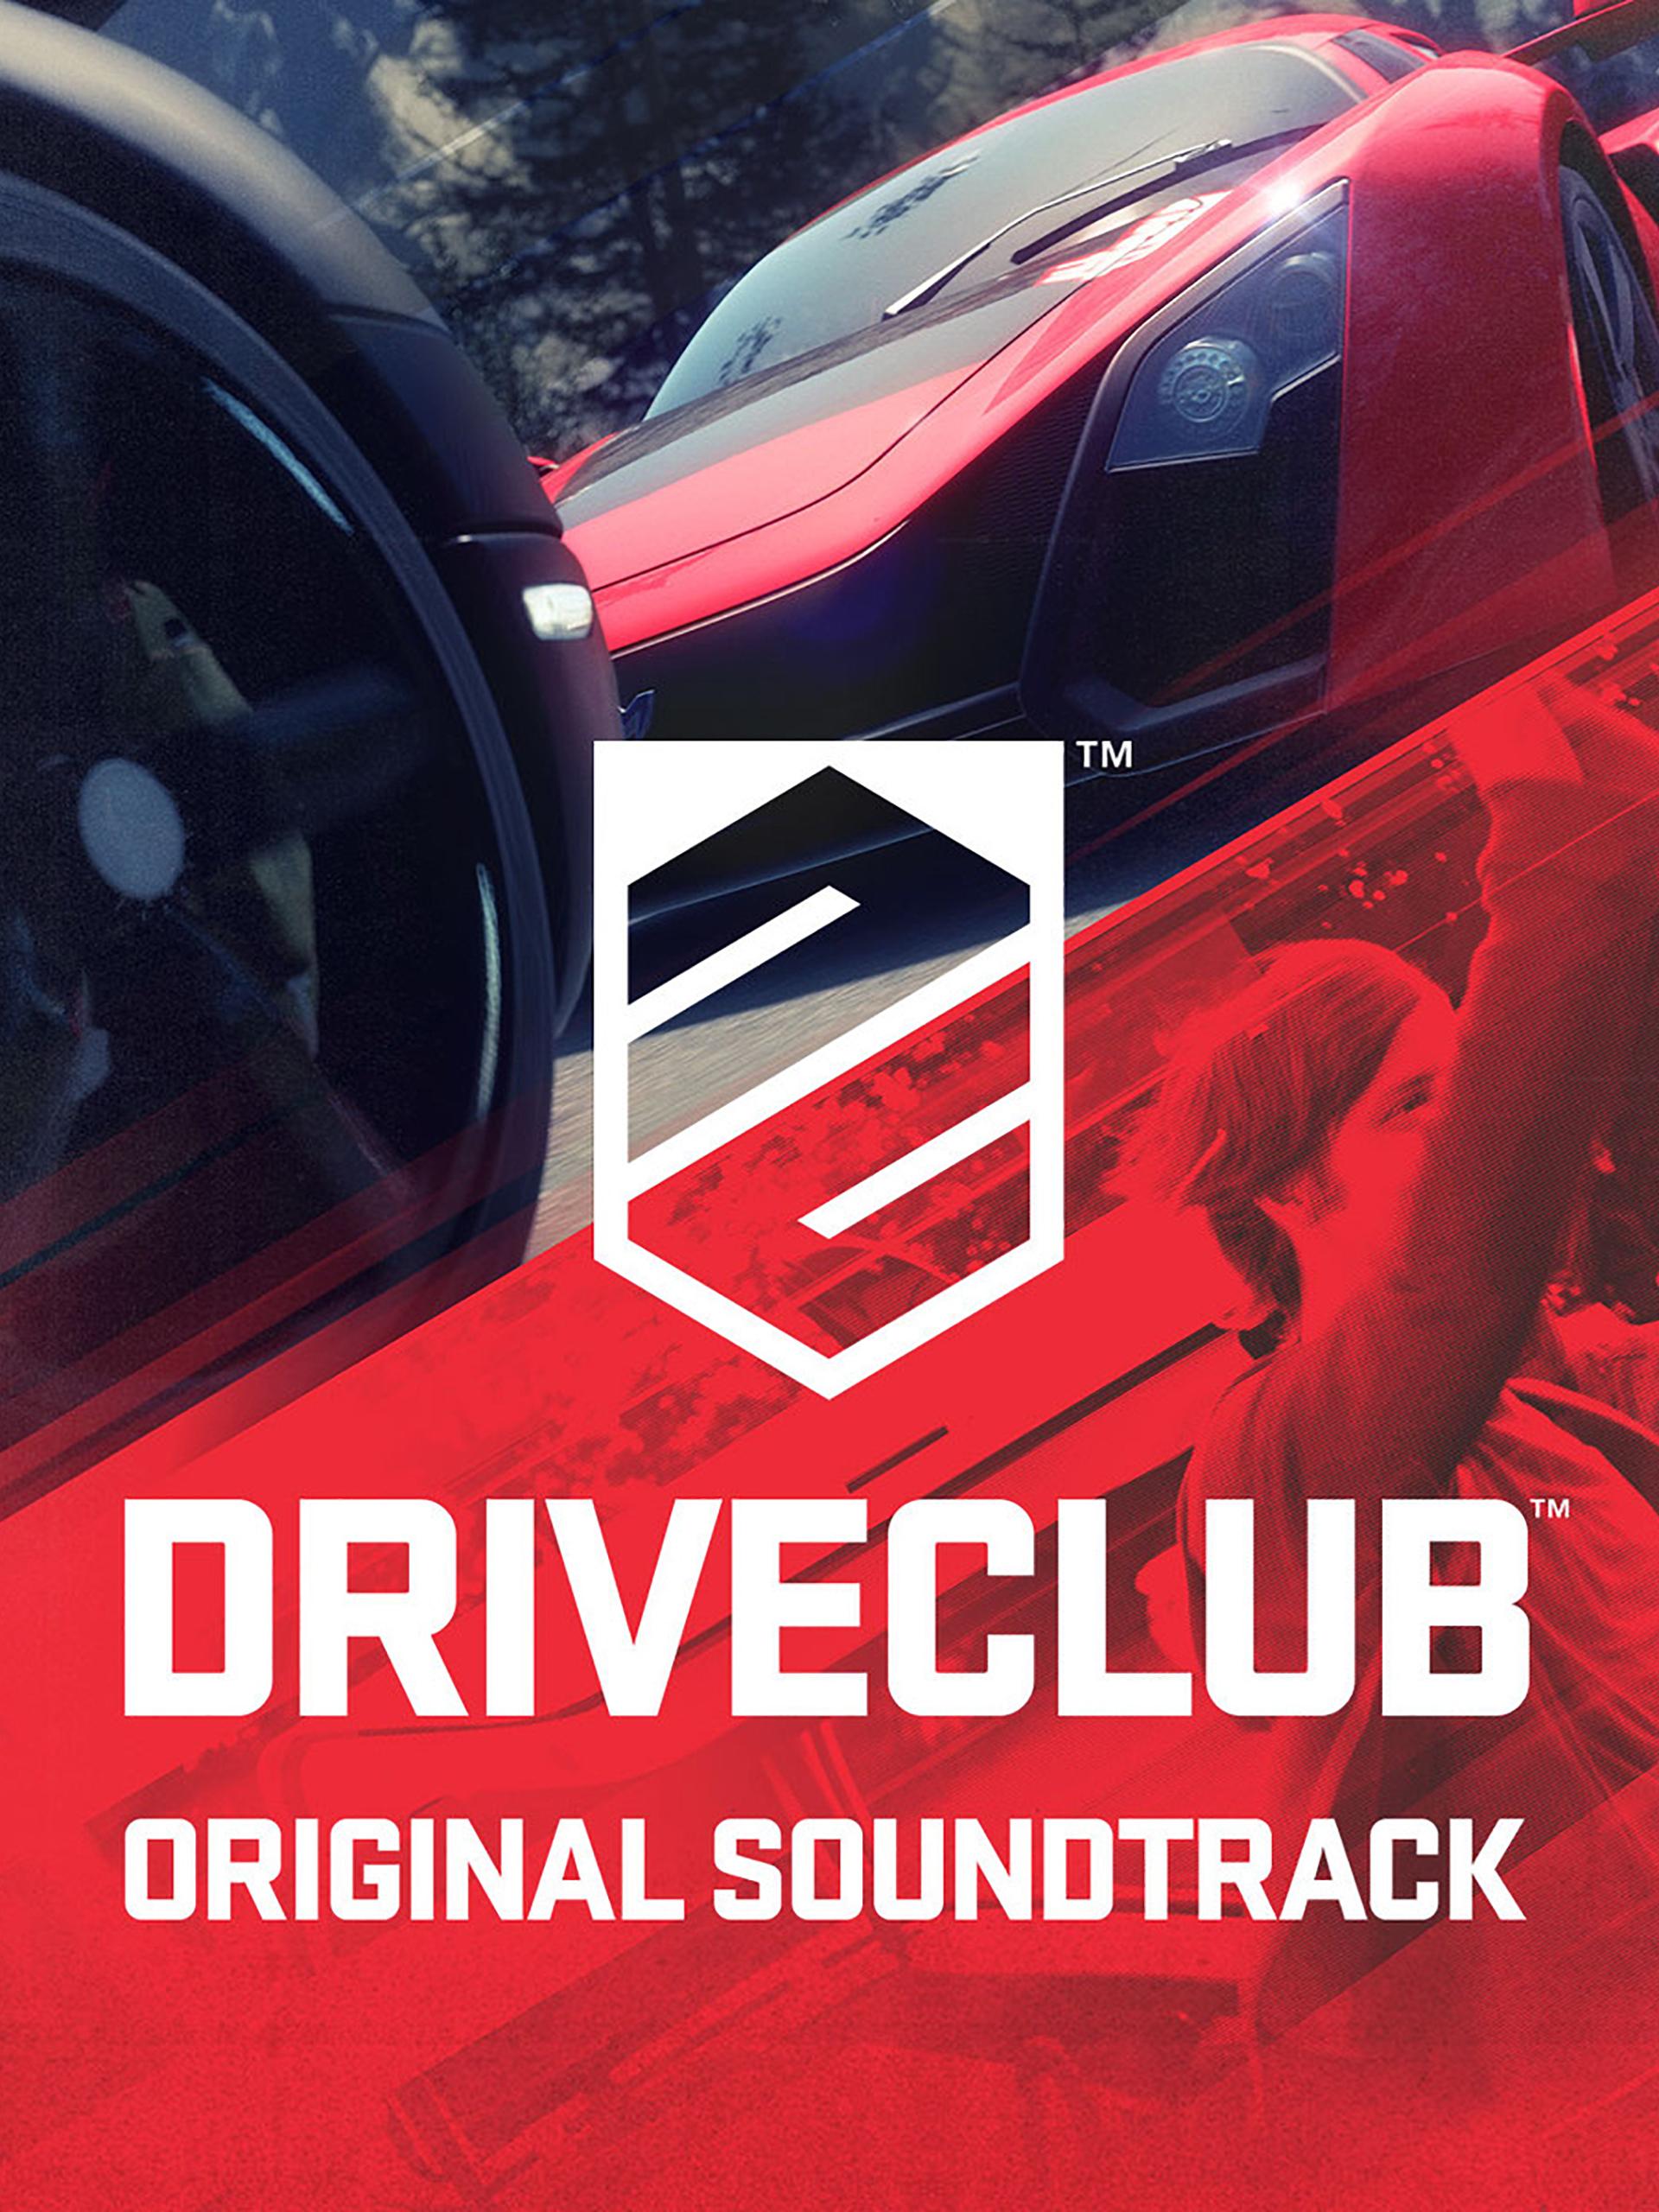 Driveclub EDIT.jpg